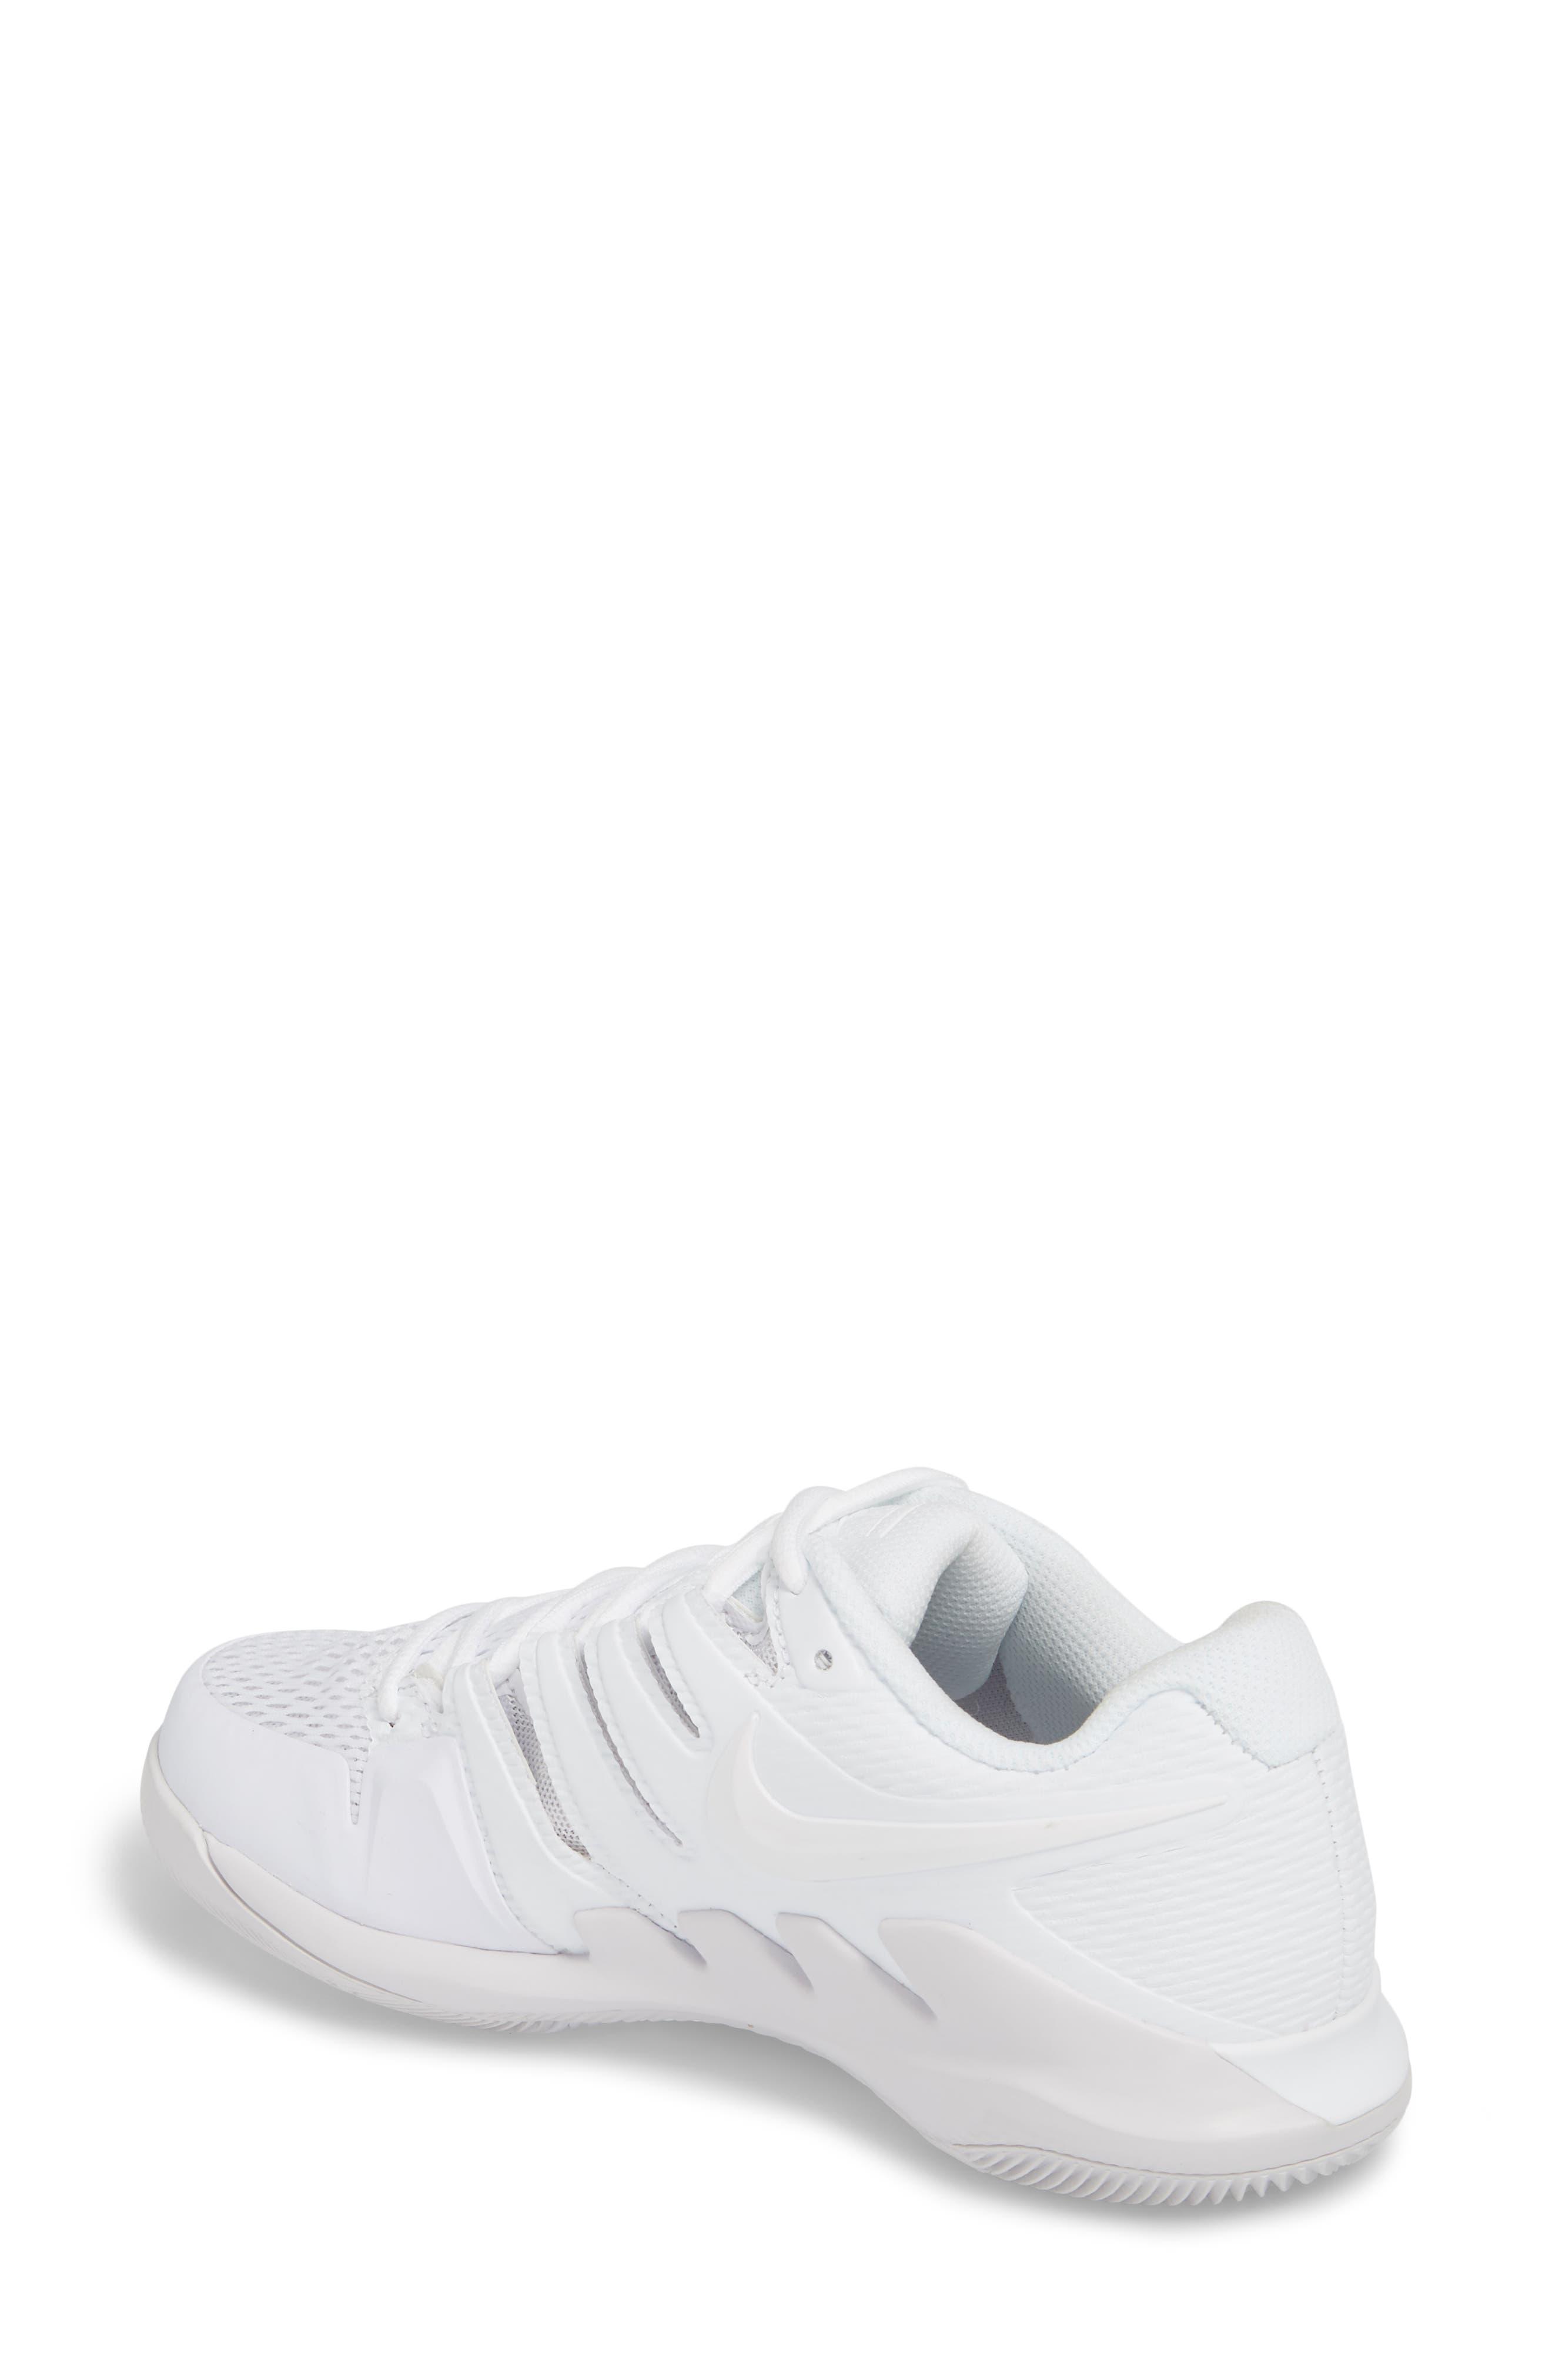 Air Zoom Vapor X Tennis Shoe,                             Alternate thumbnail 2, color,                             WHITE/ WHITE/ VAST GREY